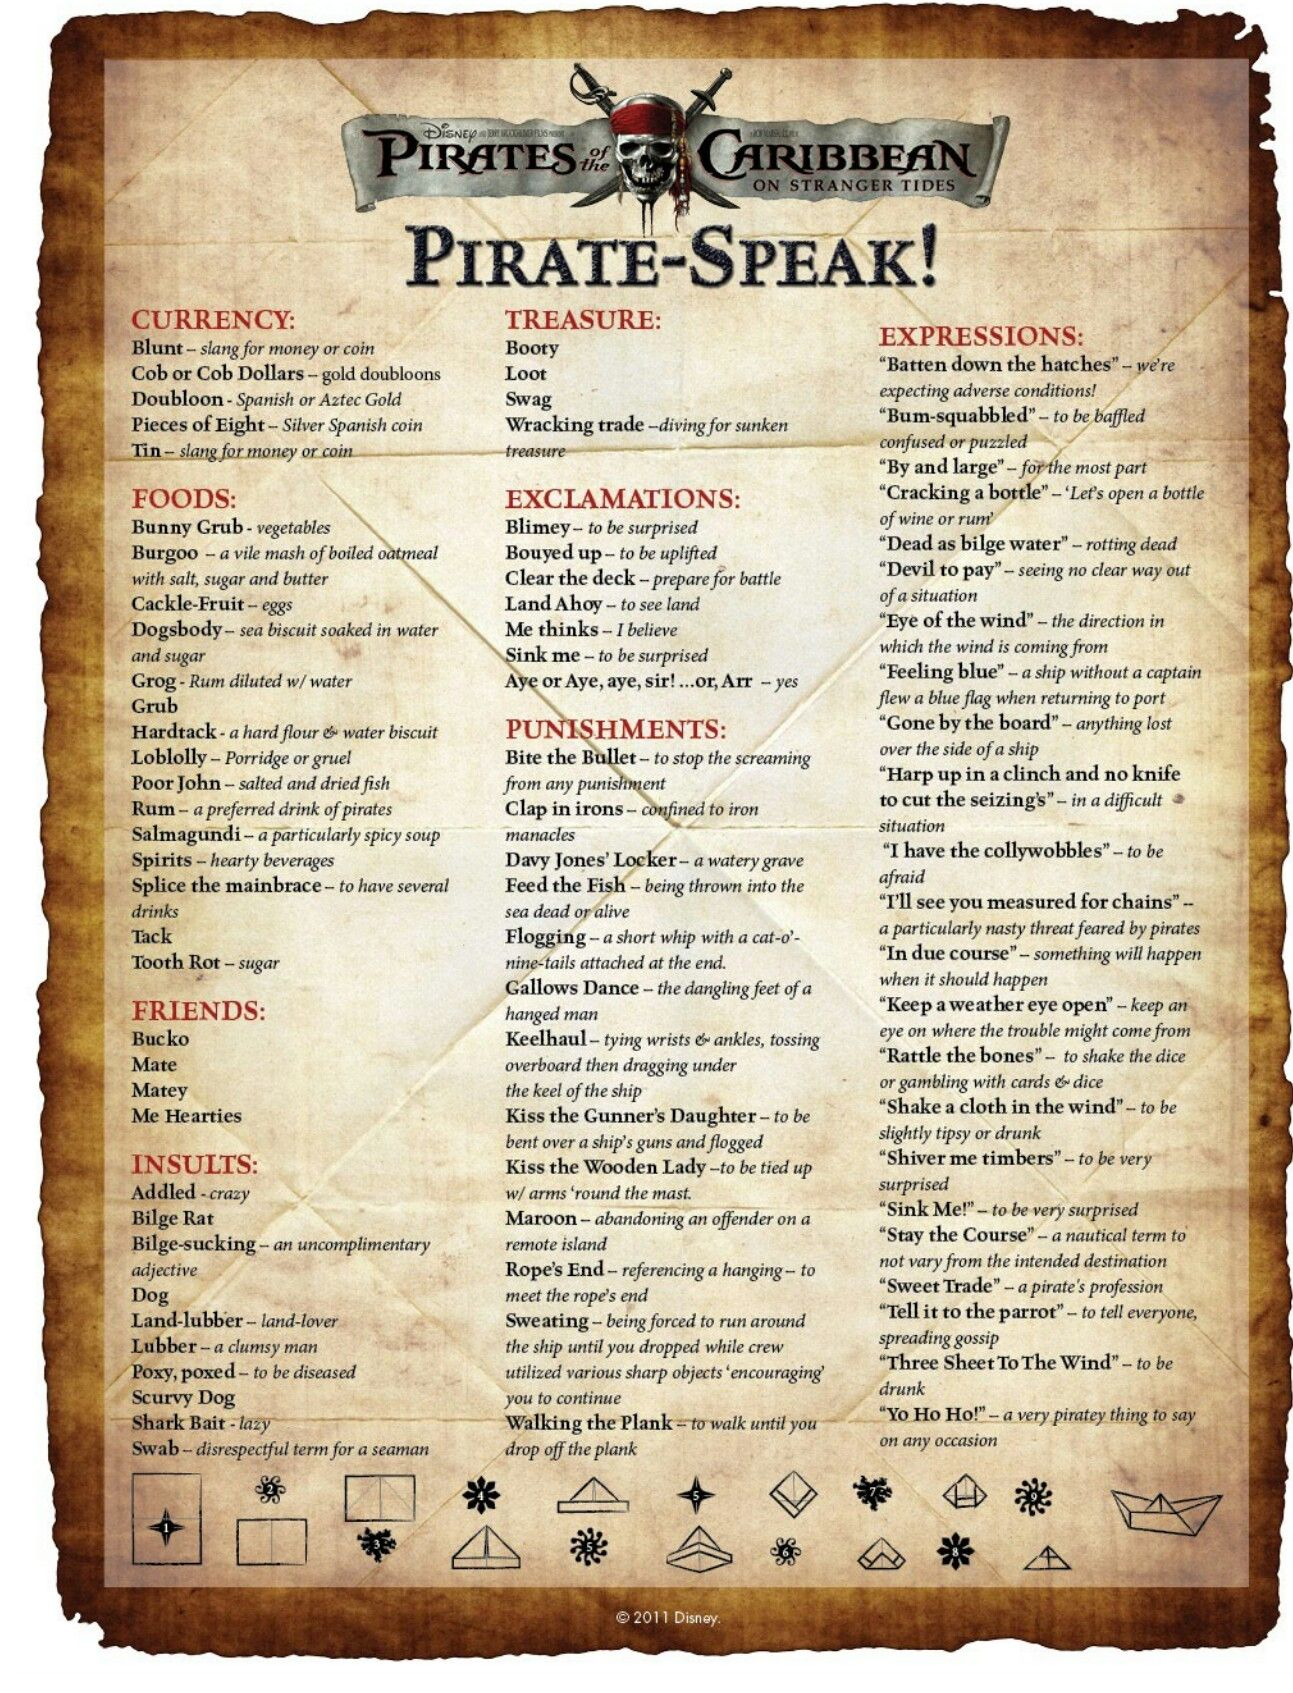 how to speak pirate language